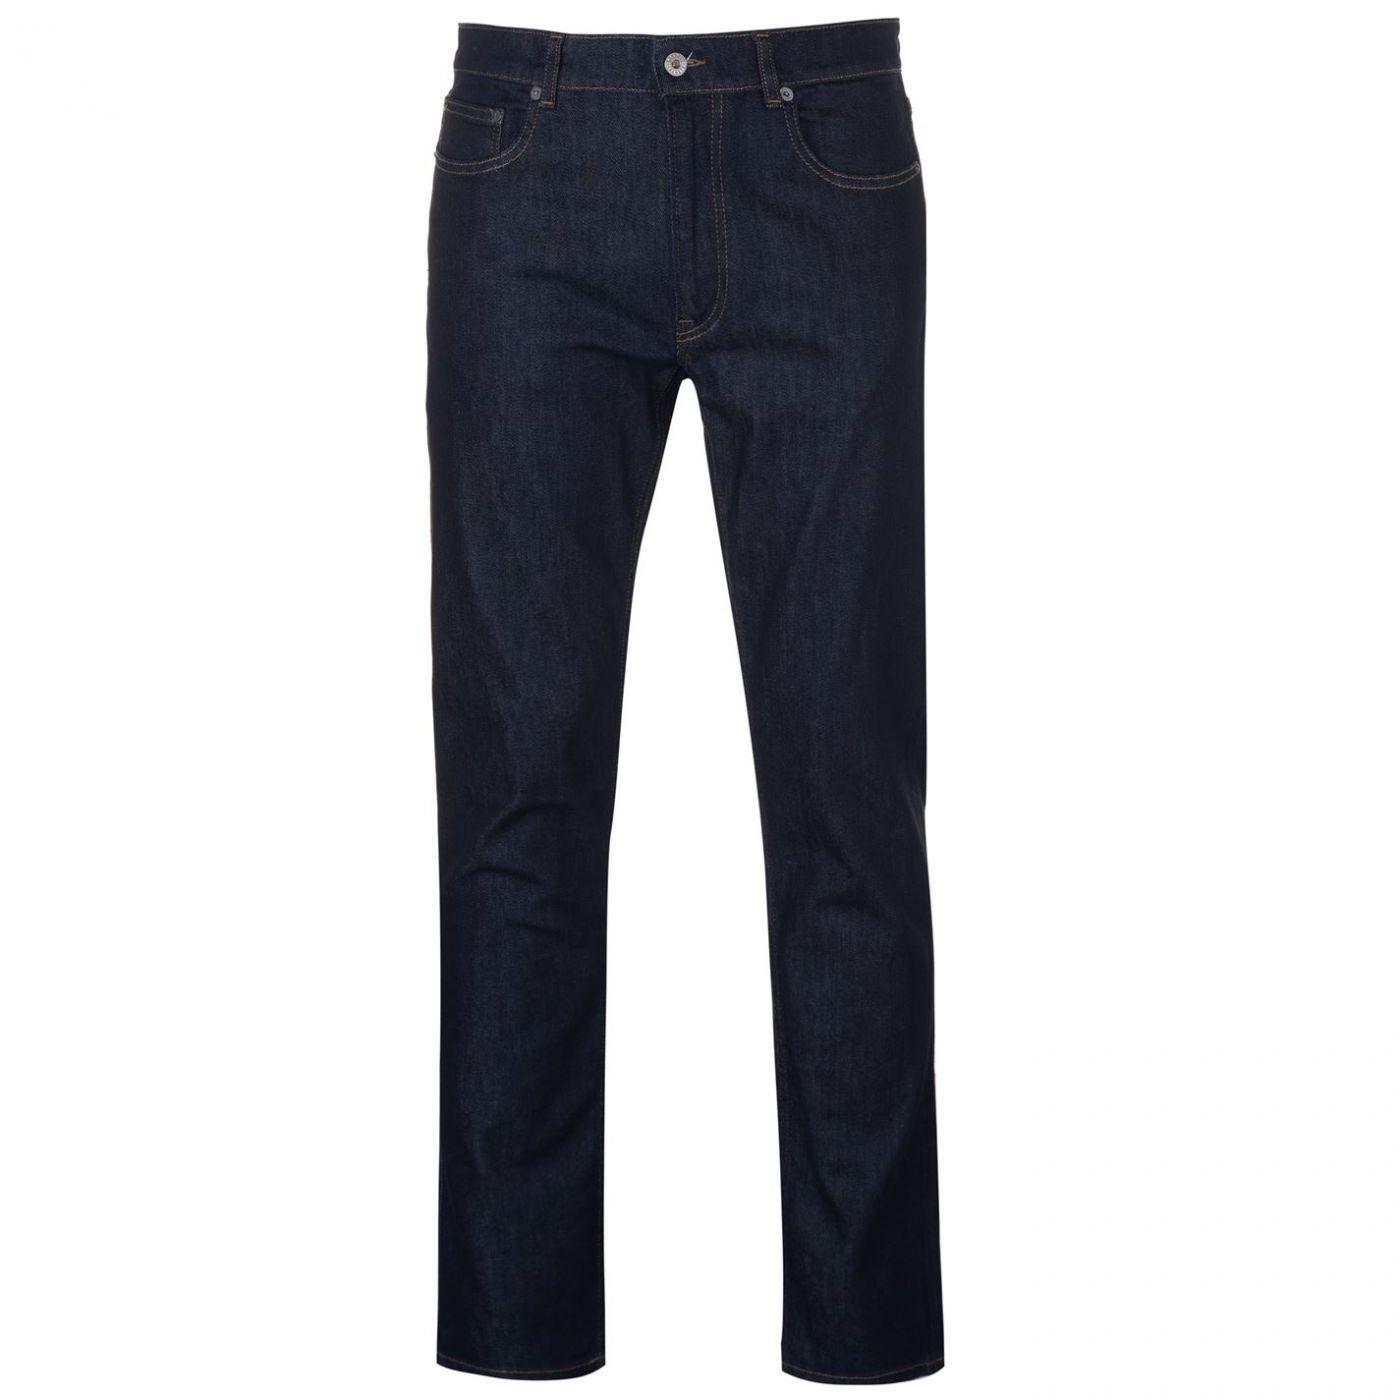 Lacoste Classic 5 Pocket Mens Jeans